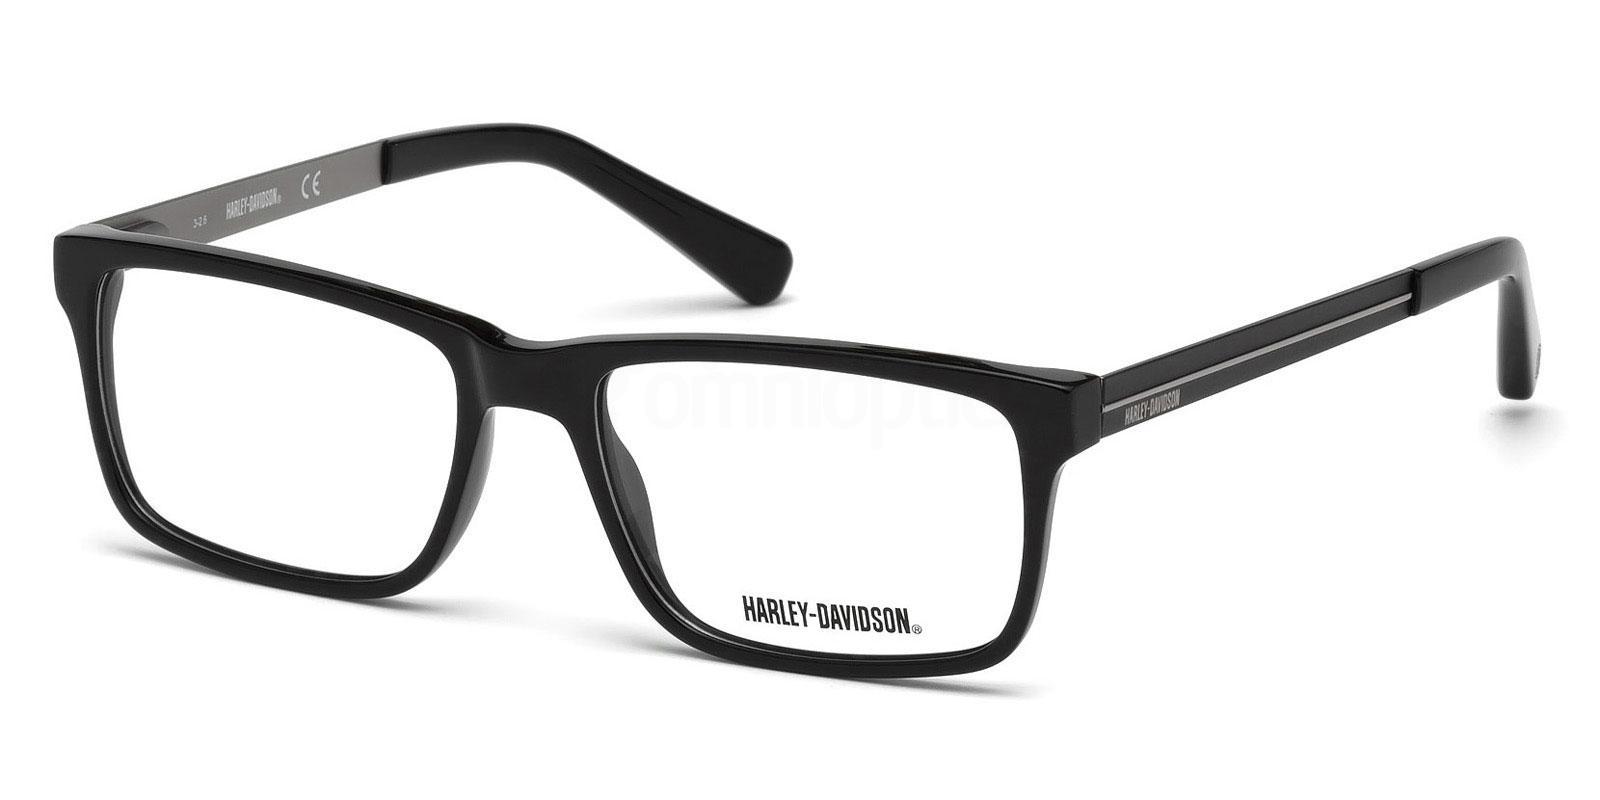 001 HD0752 Glasses, Harley Davidson